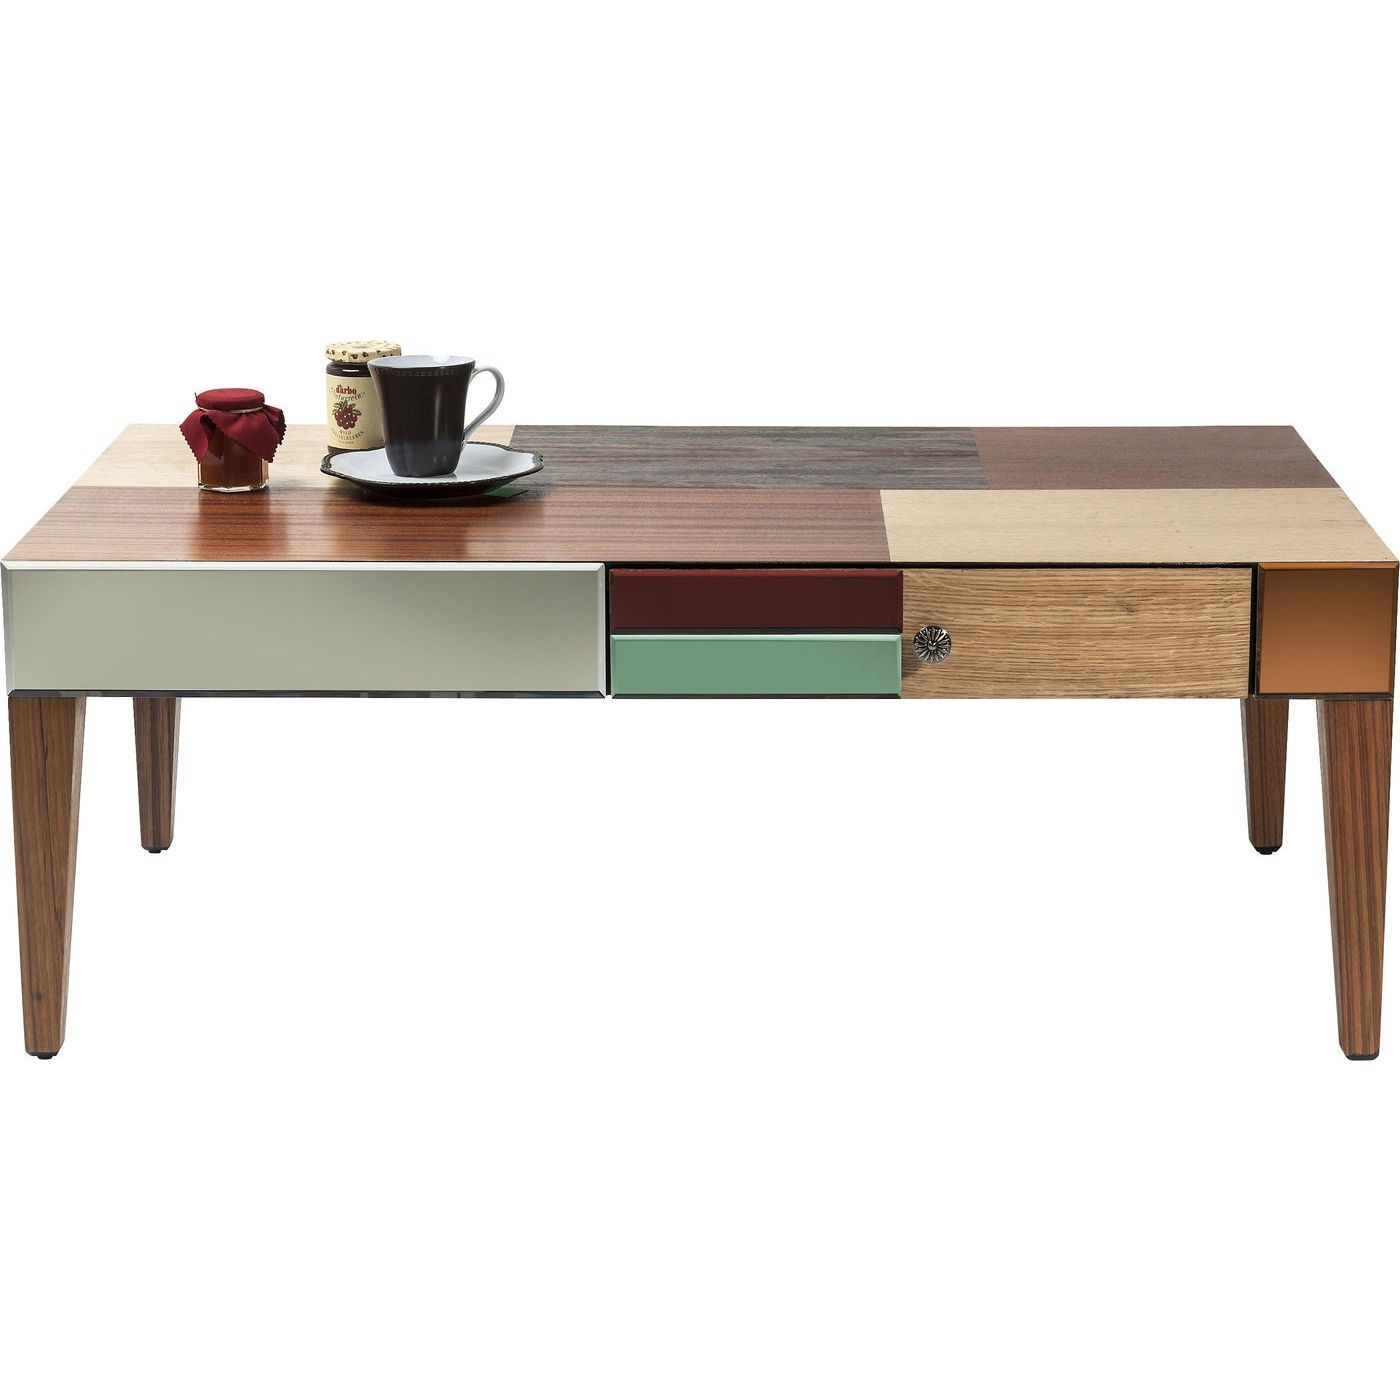 Couch table Metamorphosis